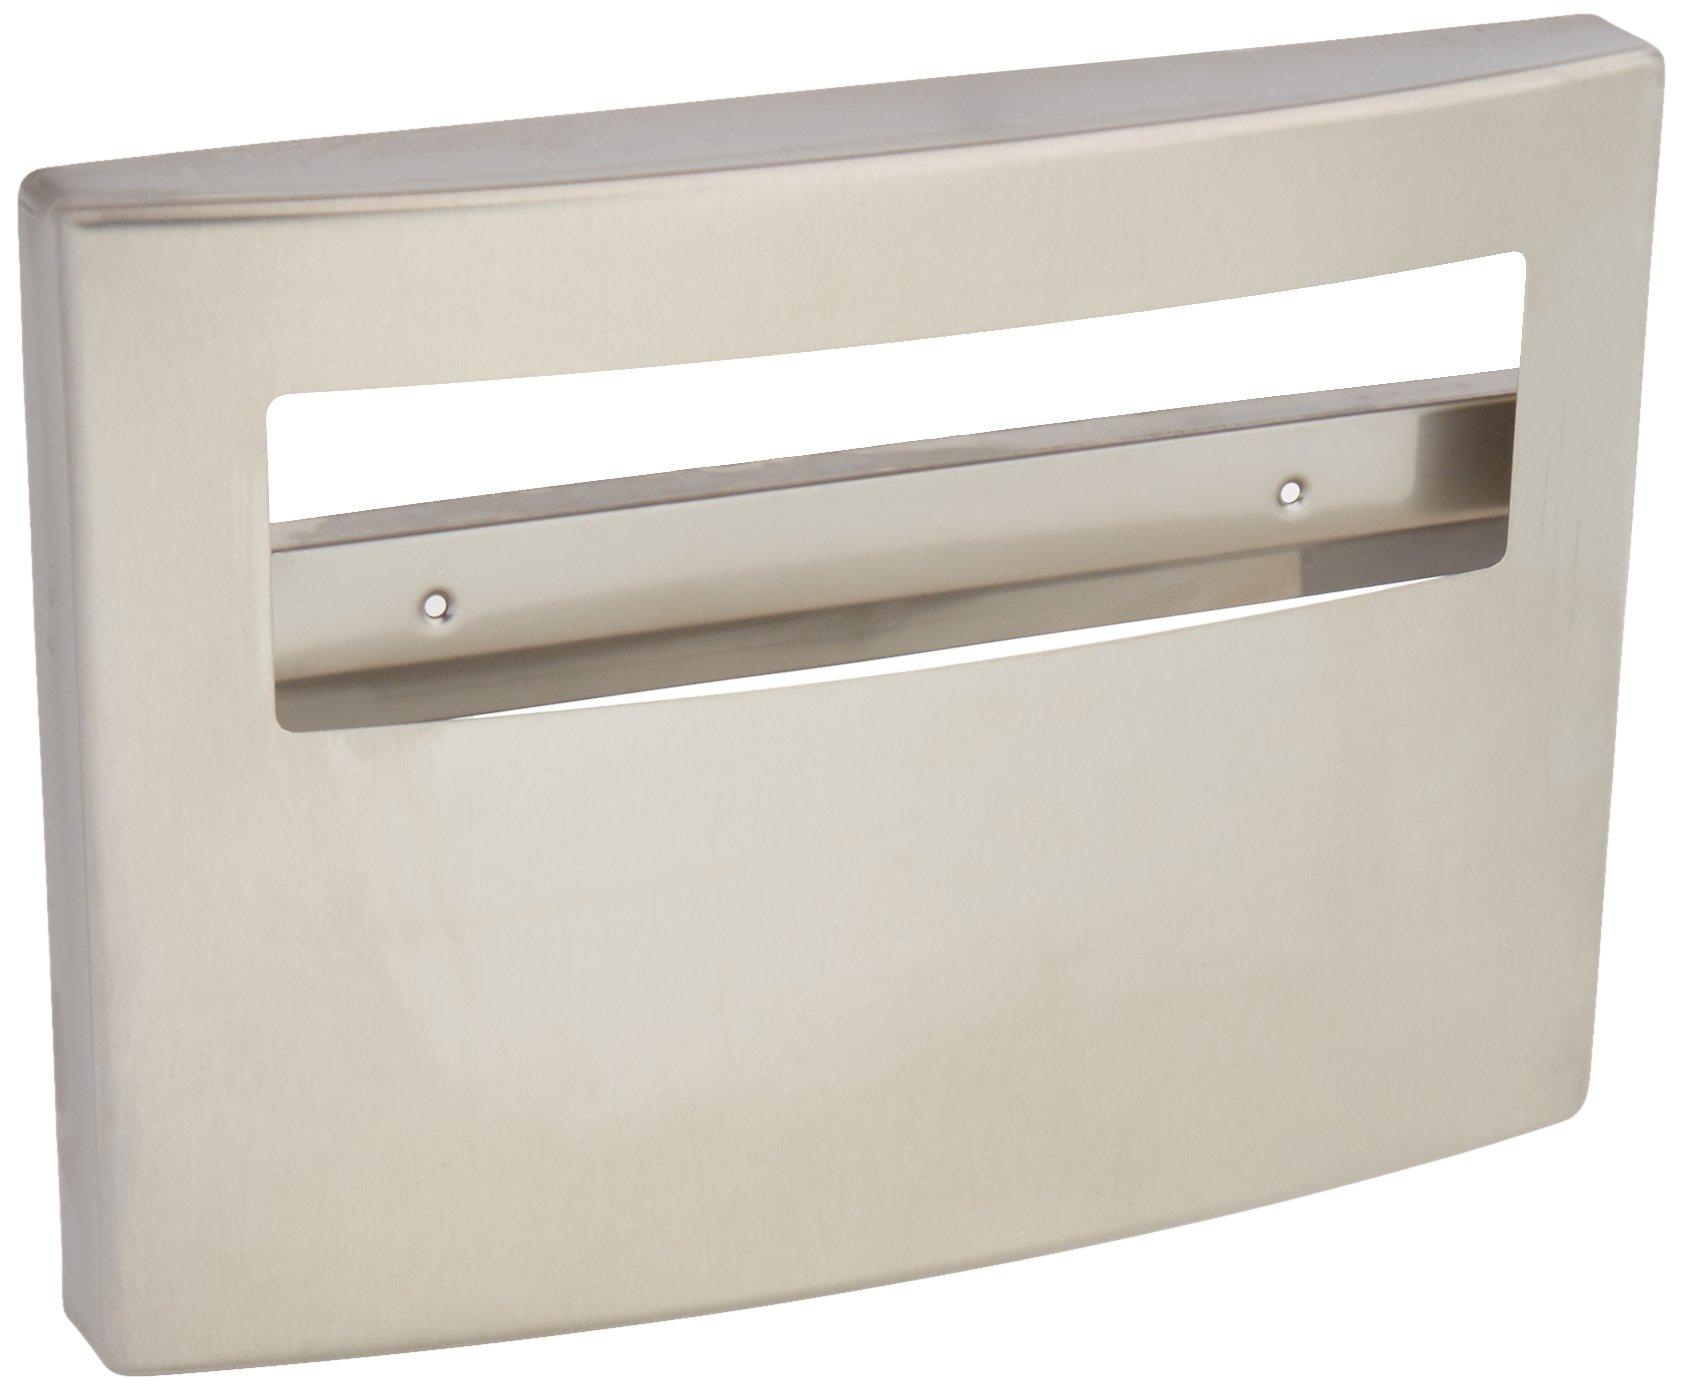 Bobrick 4221 Toilet Seat Cover Dispenser, 15 3/4 x 2 1/4 x 11 1/4, Satin Stainless Steel